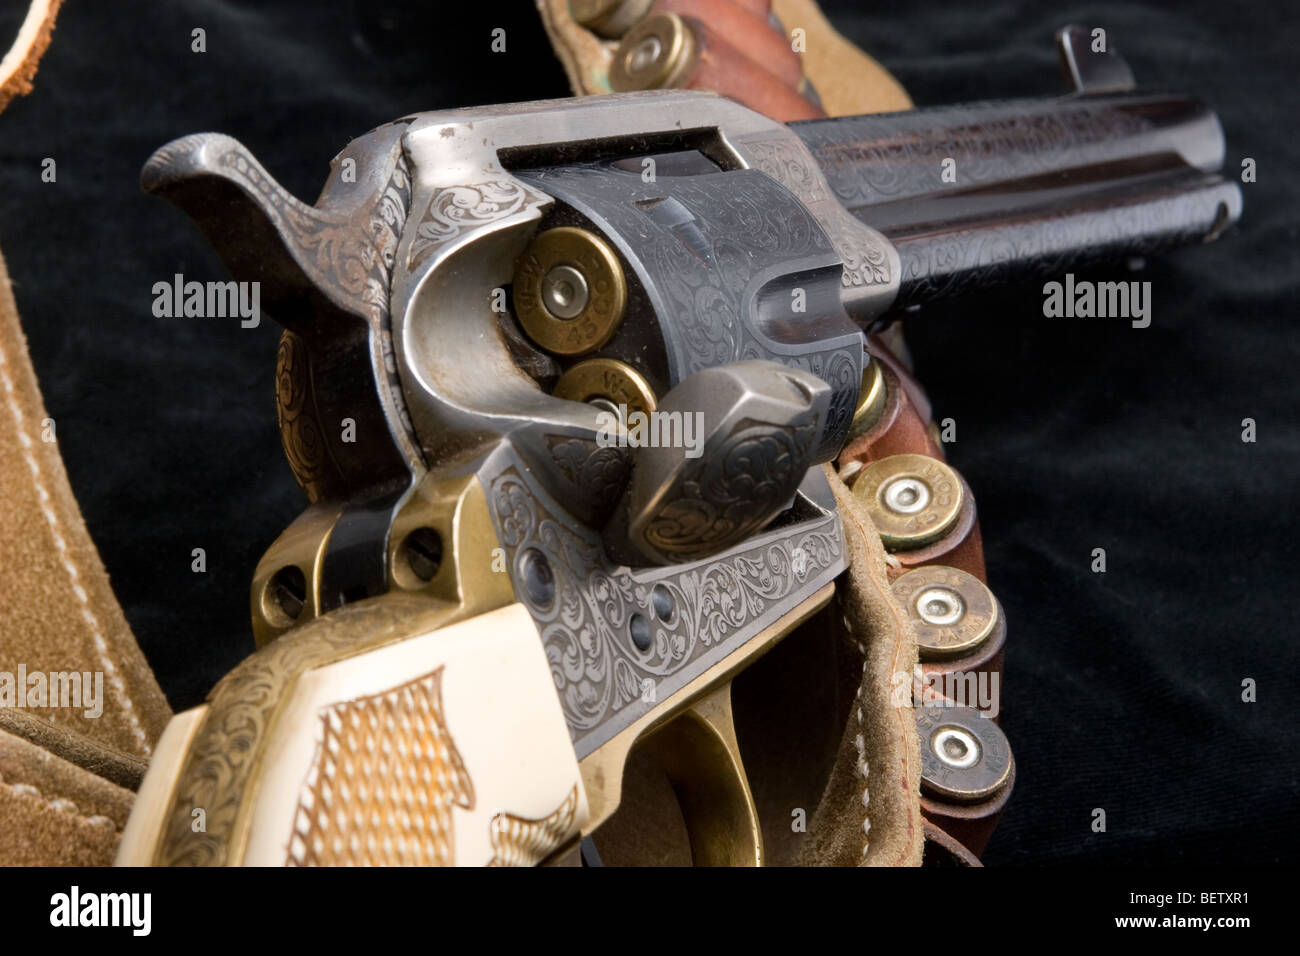 Cowboy & movie actor John Wayne's Colt 45 sixshooter and bullets. - Stock Image